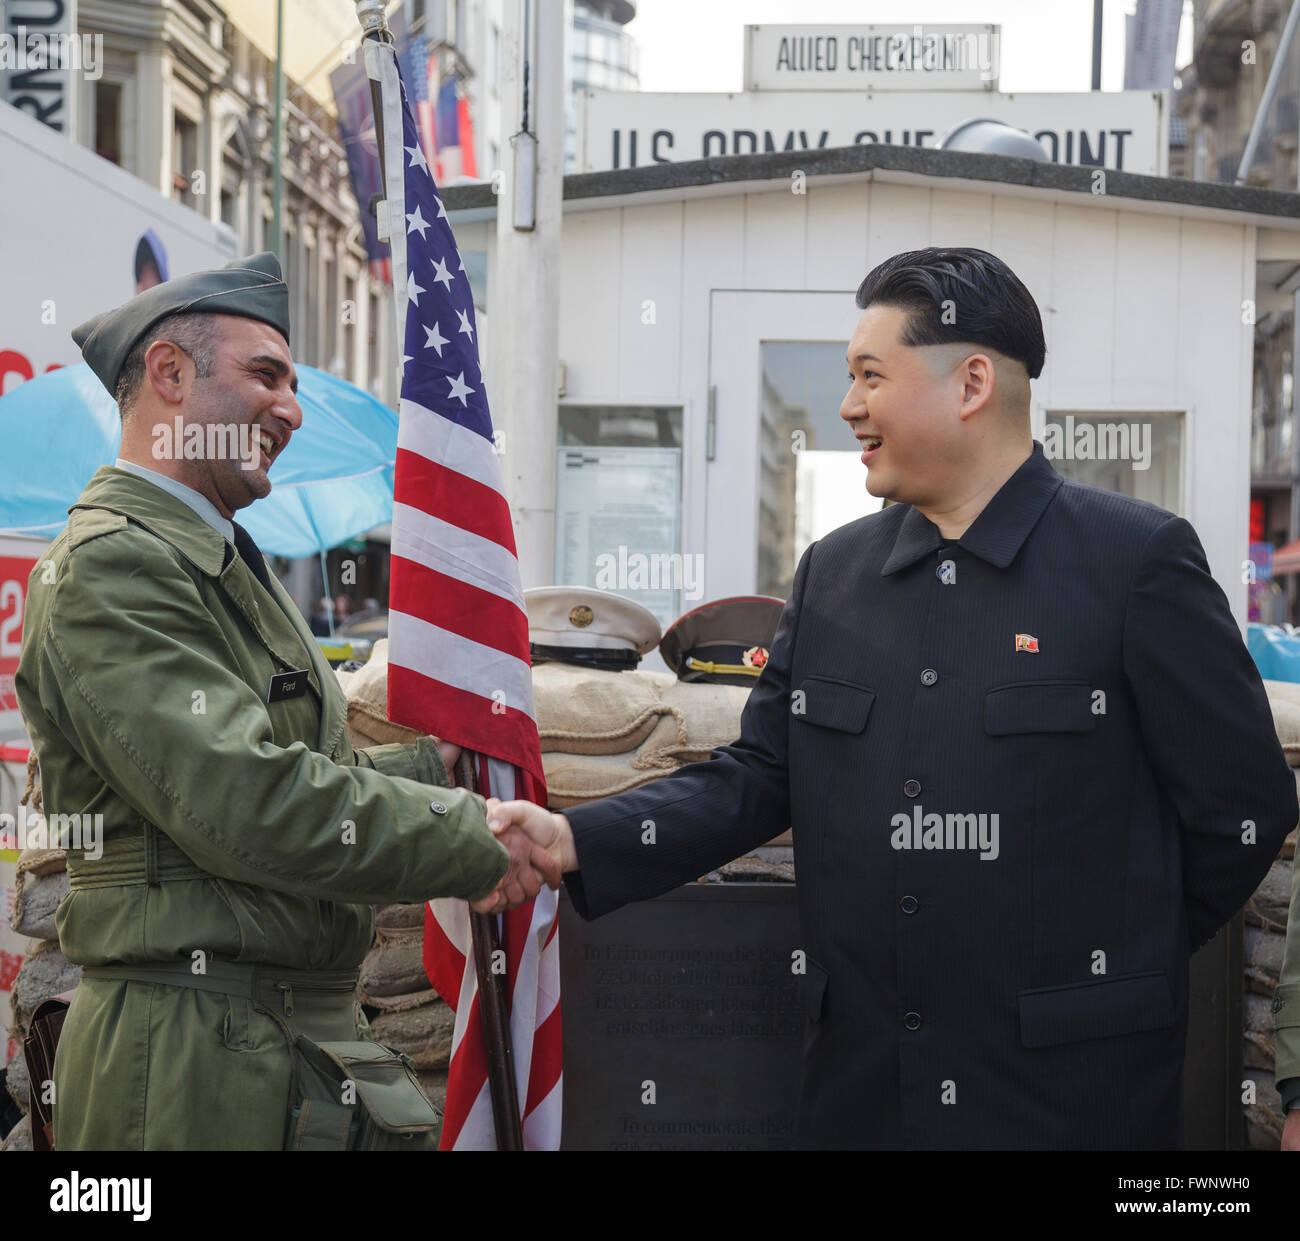 berlin-germany-6th-april-2016-kim-jong-u